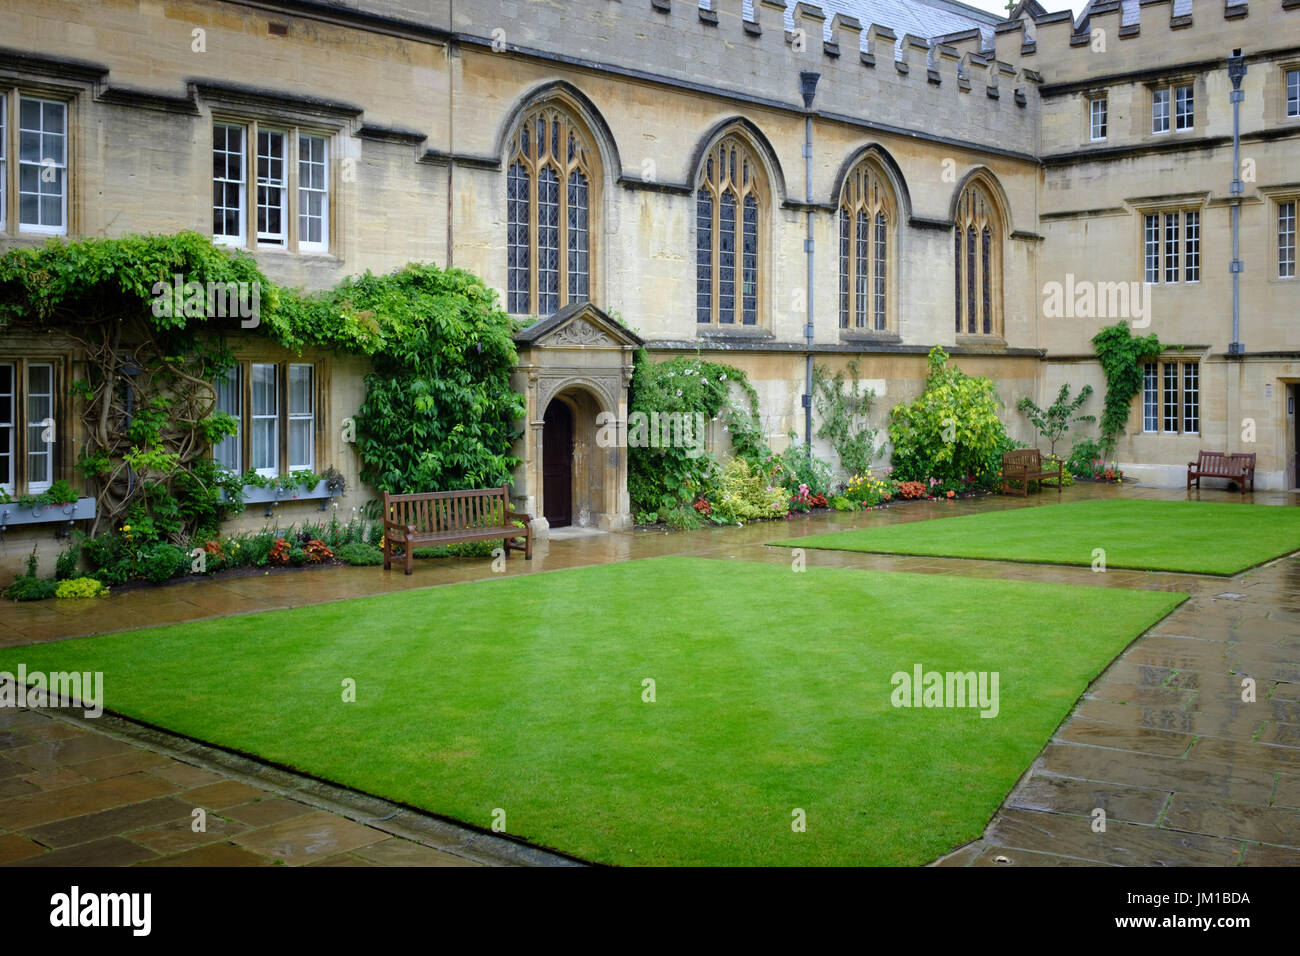 Jesus College, Oxford - Stock Image